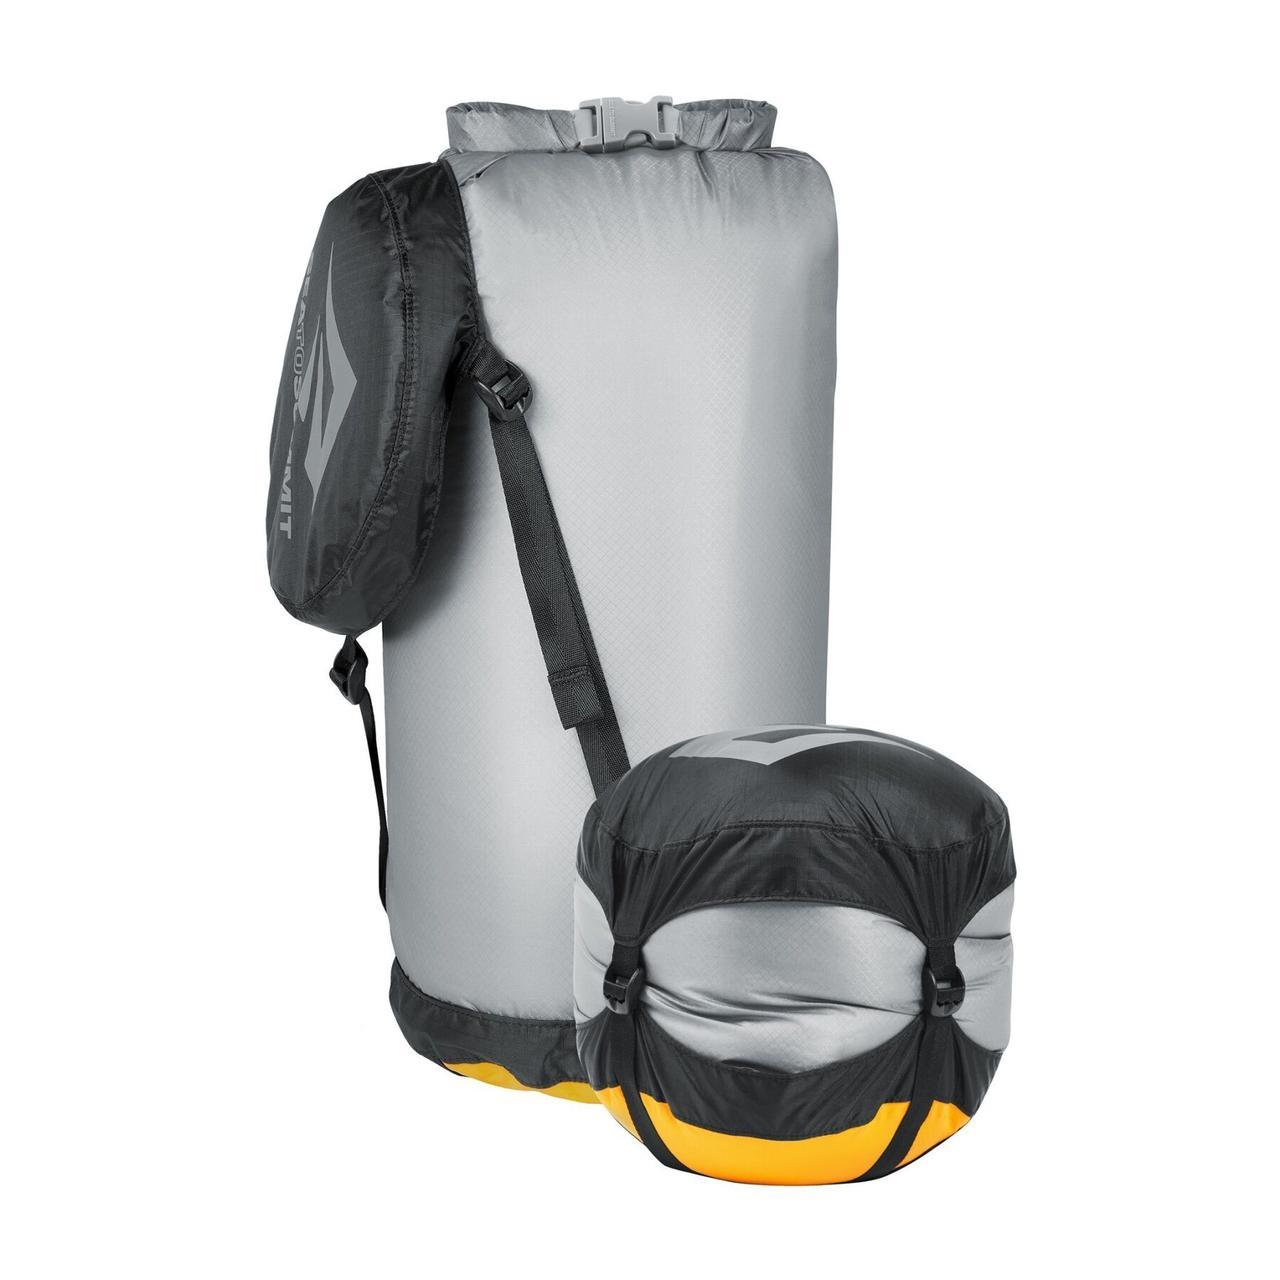 Компрессионный гермомешок Sea To Summit - Ultra-Sil Compression Dry Sack Grey, 10 л (STS AUCDSS)